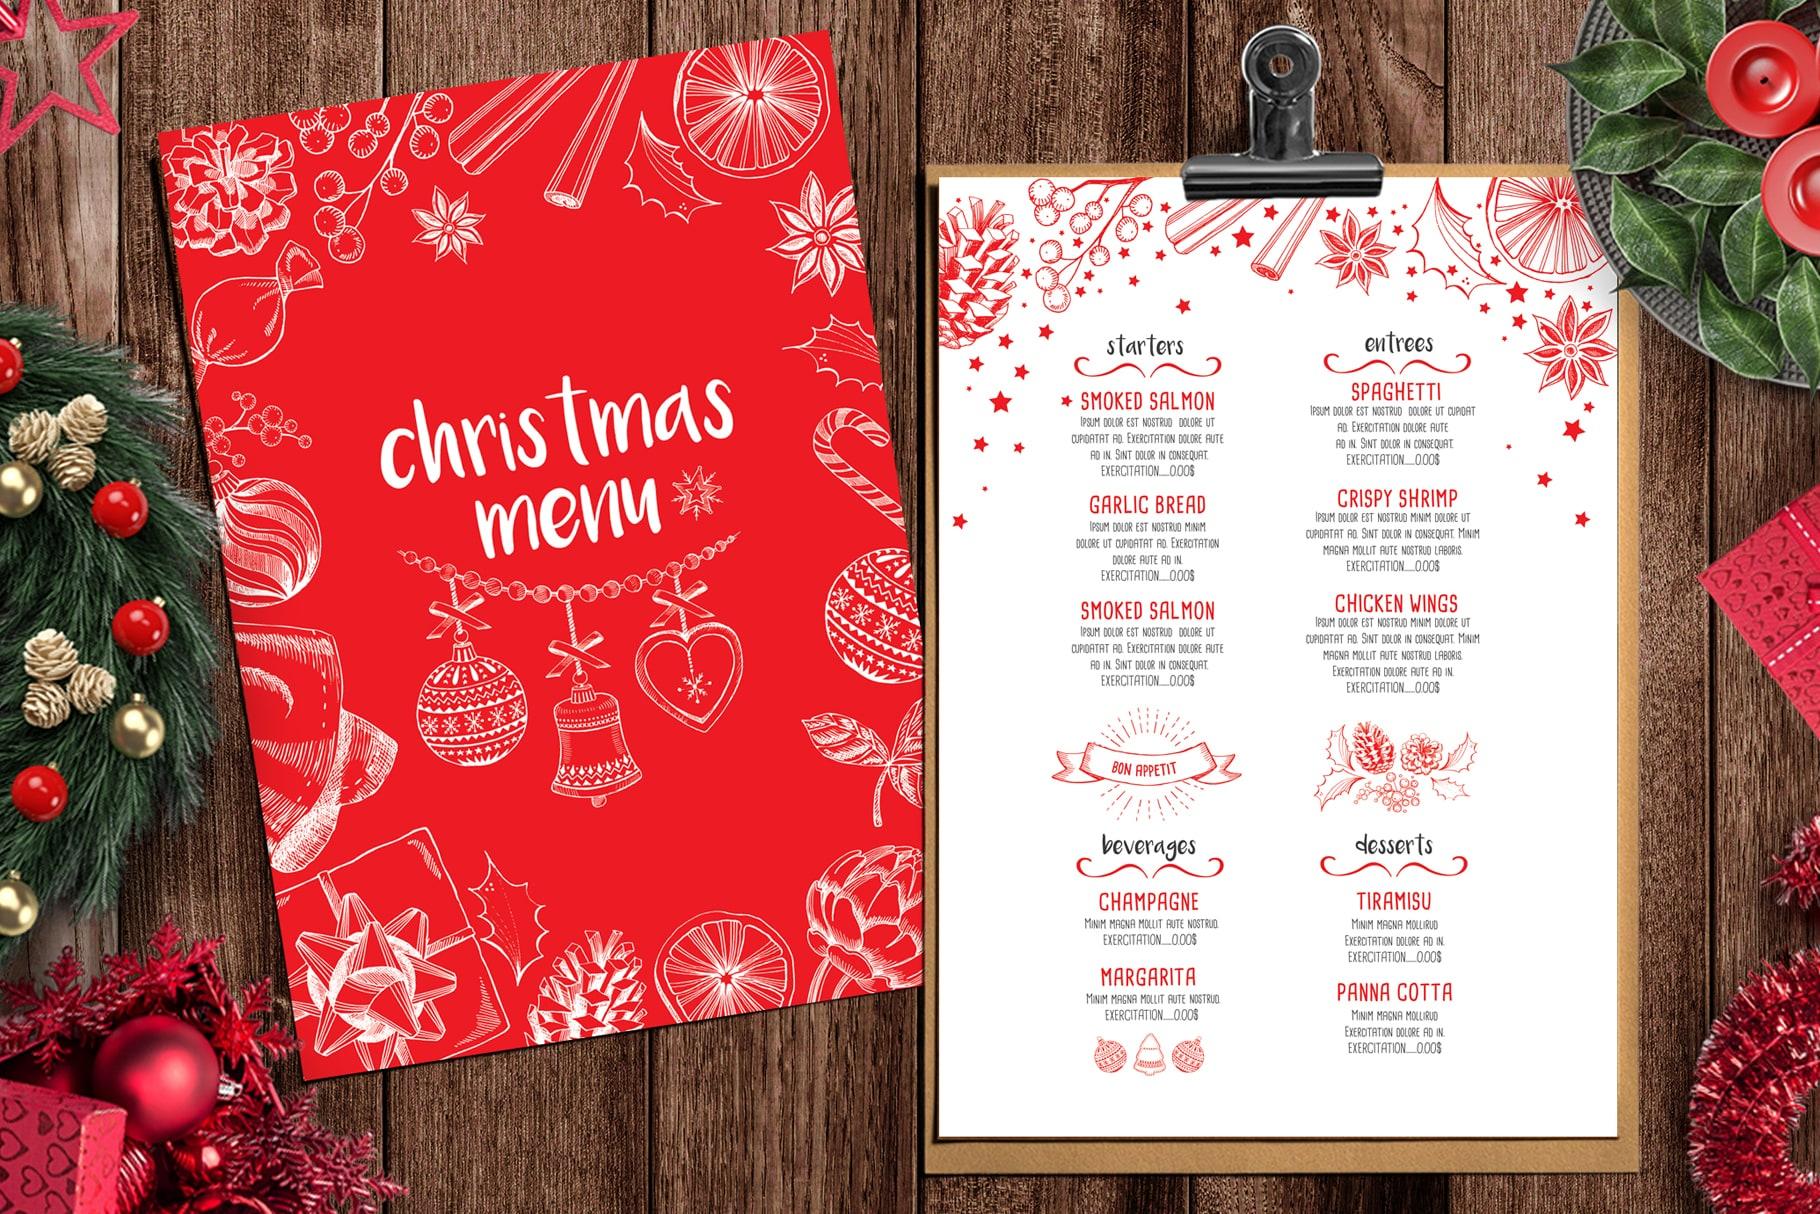 christmas food menu party template for restaurant design chalkboard festive dinner